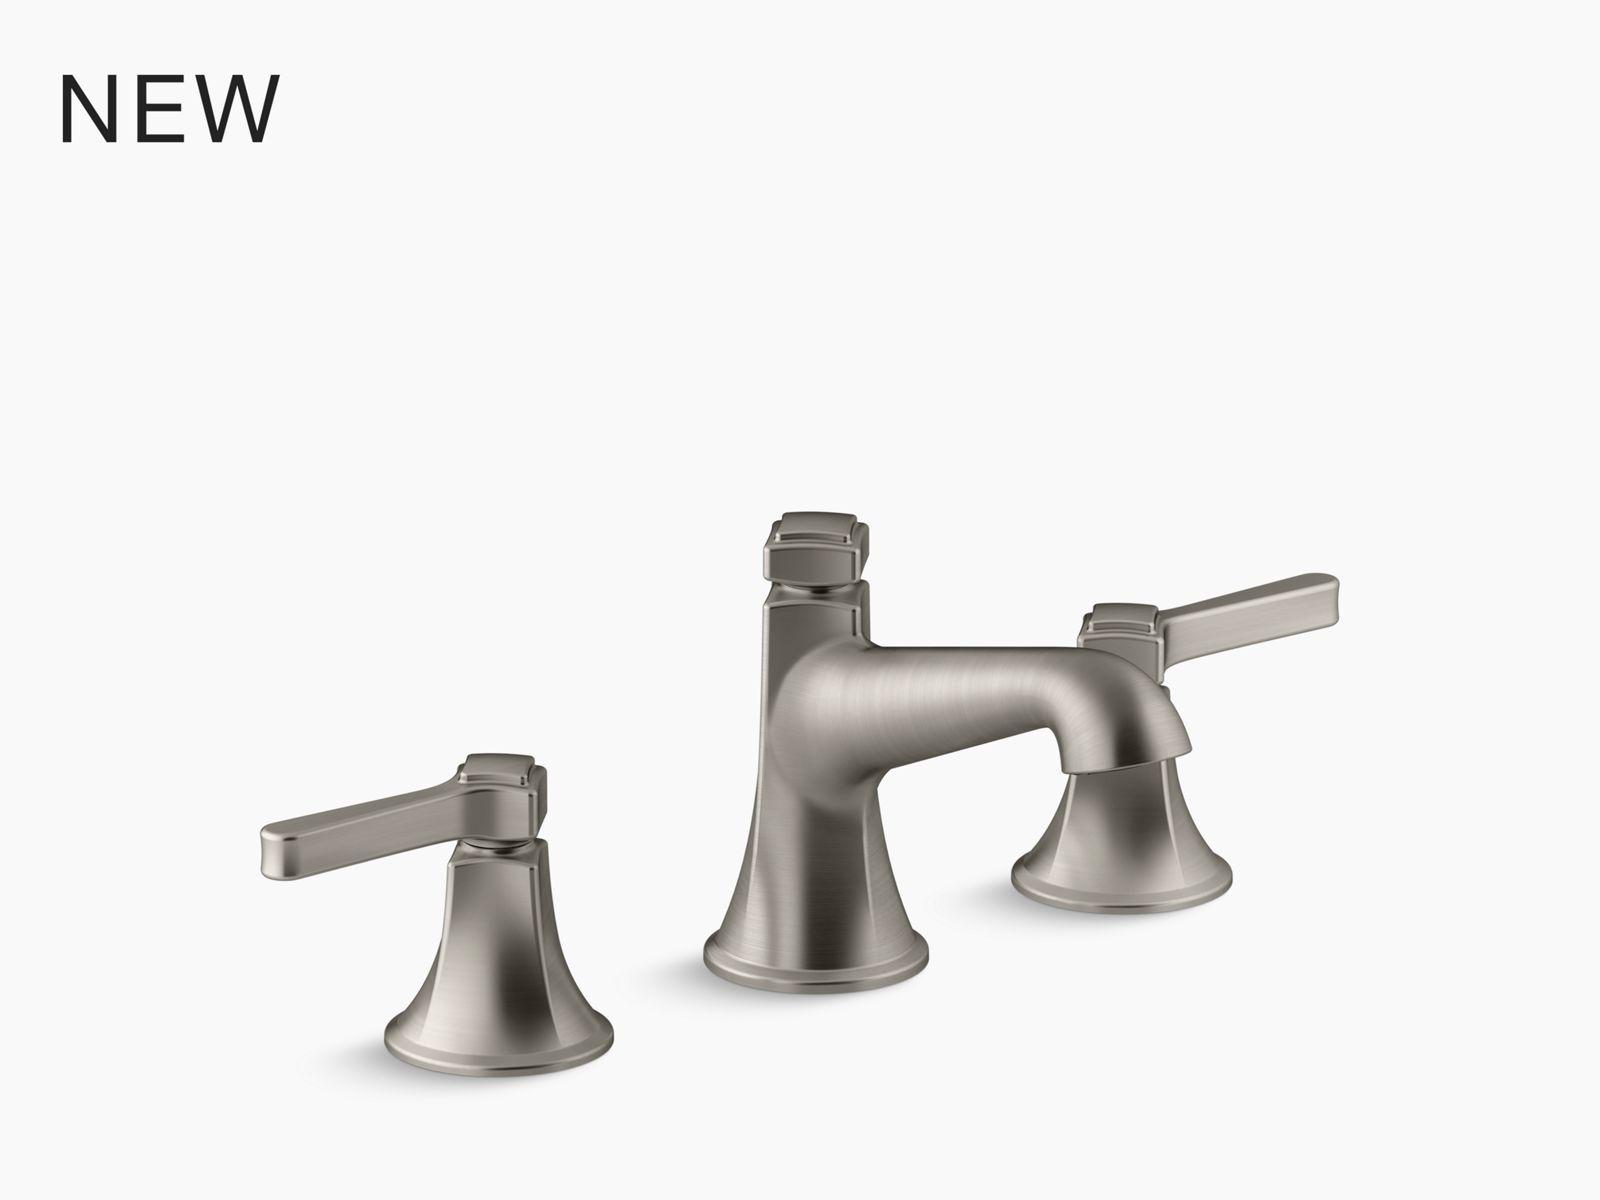 K 77974 4 Components Bathroom Sink Handles With Lever Design